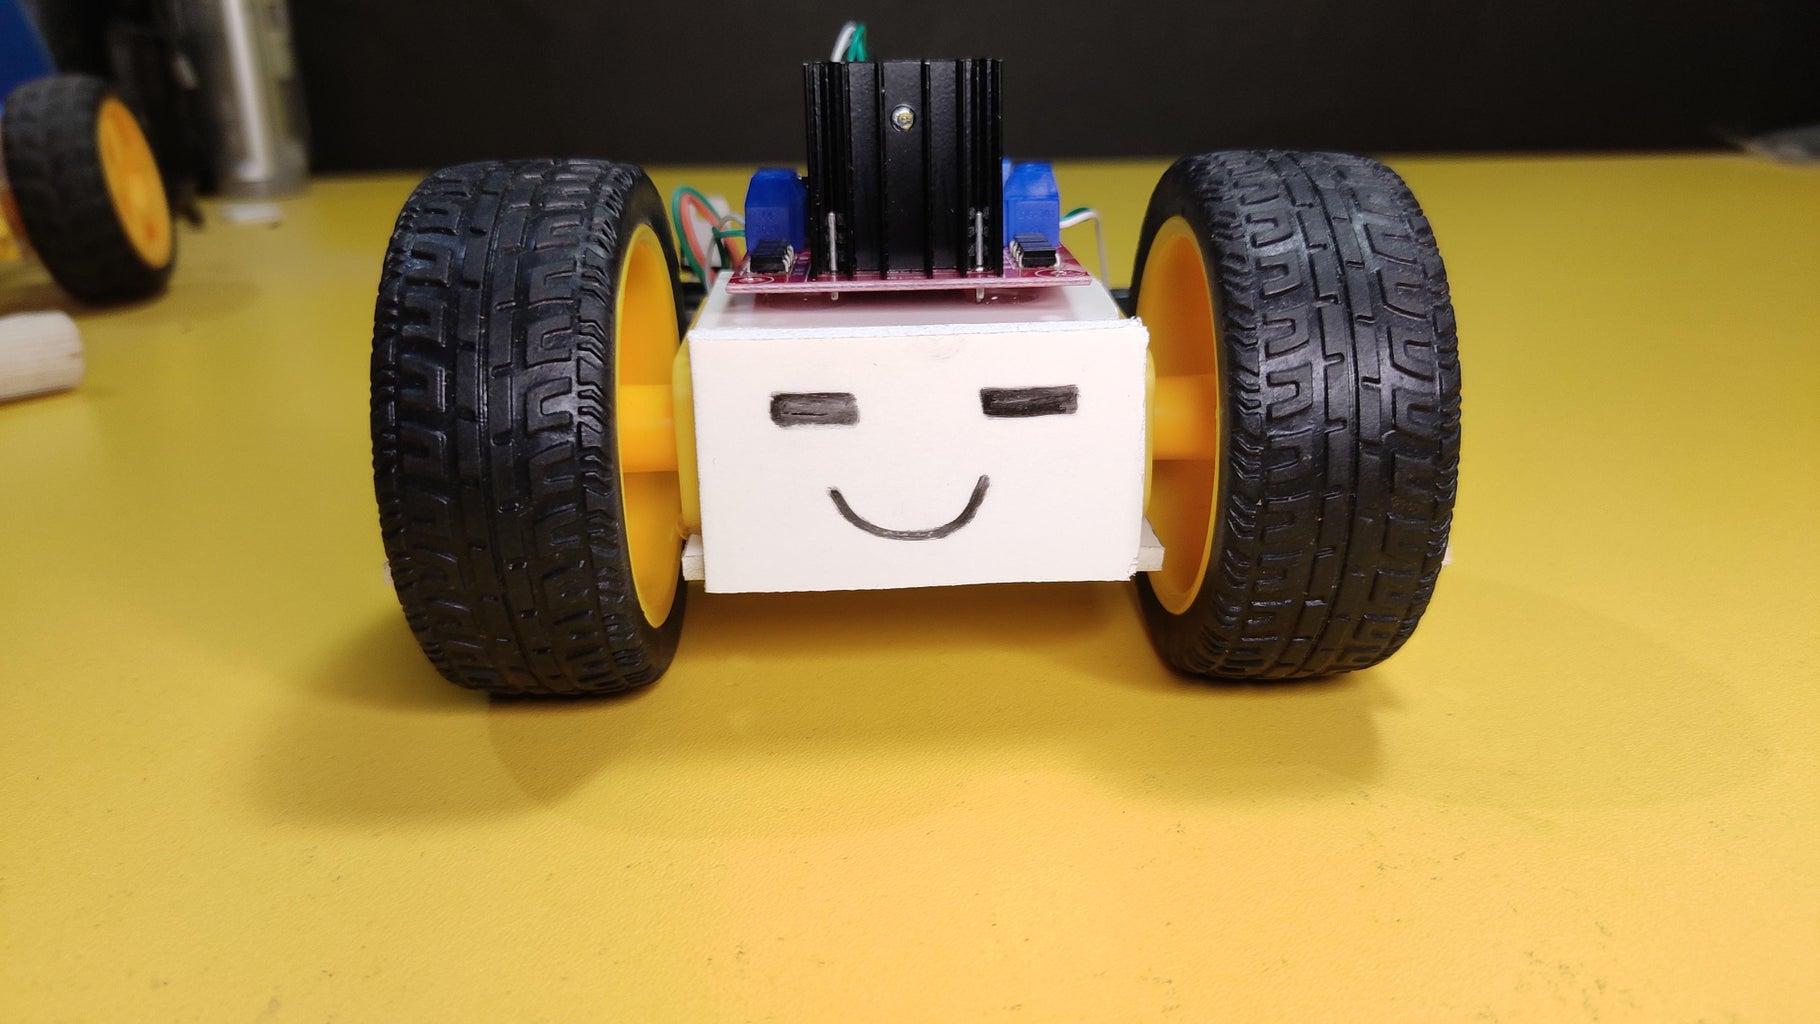 Power the Bot, Run App and Go!